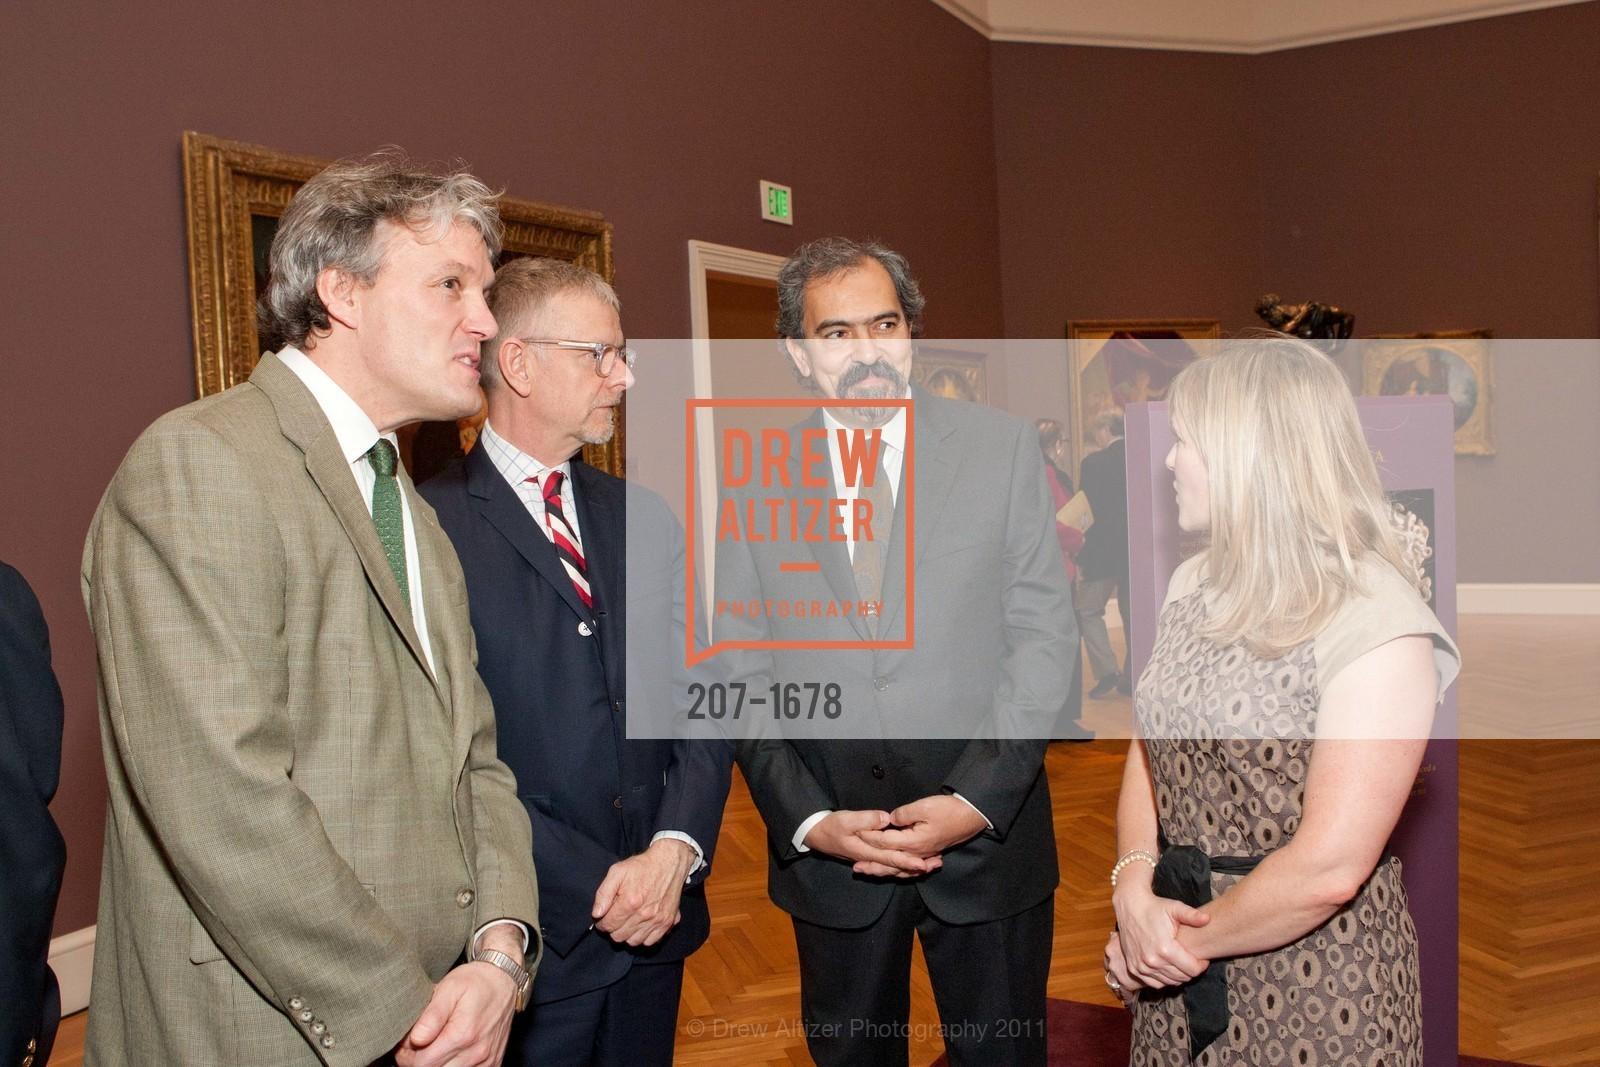 Julian Cox, Martin Chapman, Claudio Parisi Presicce, Maria Santangelo, Photo #207-1678